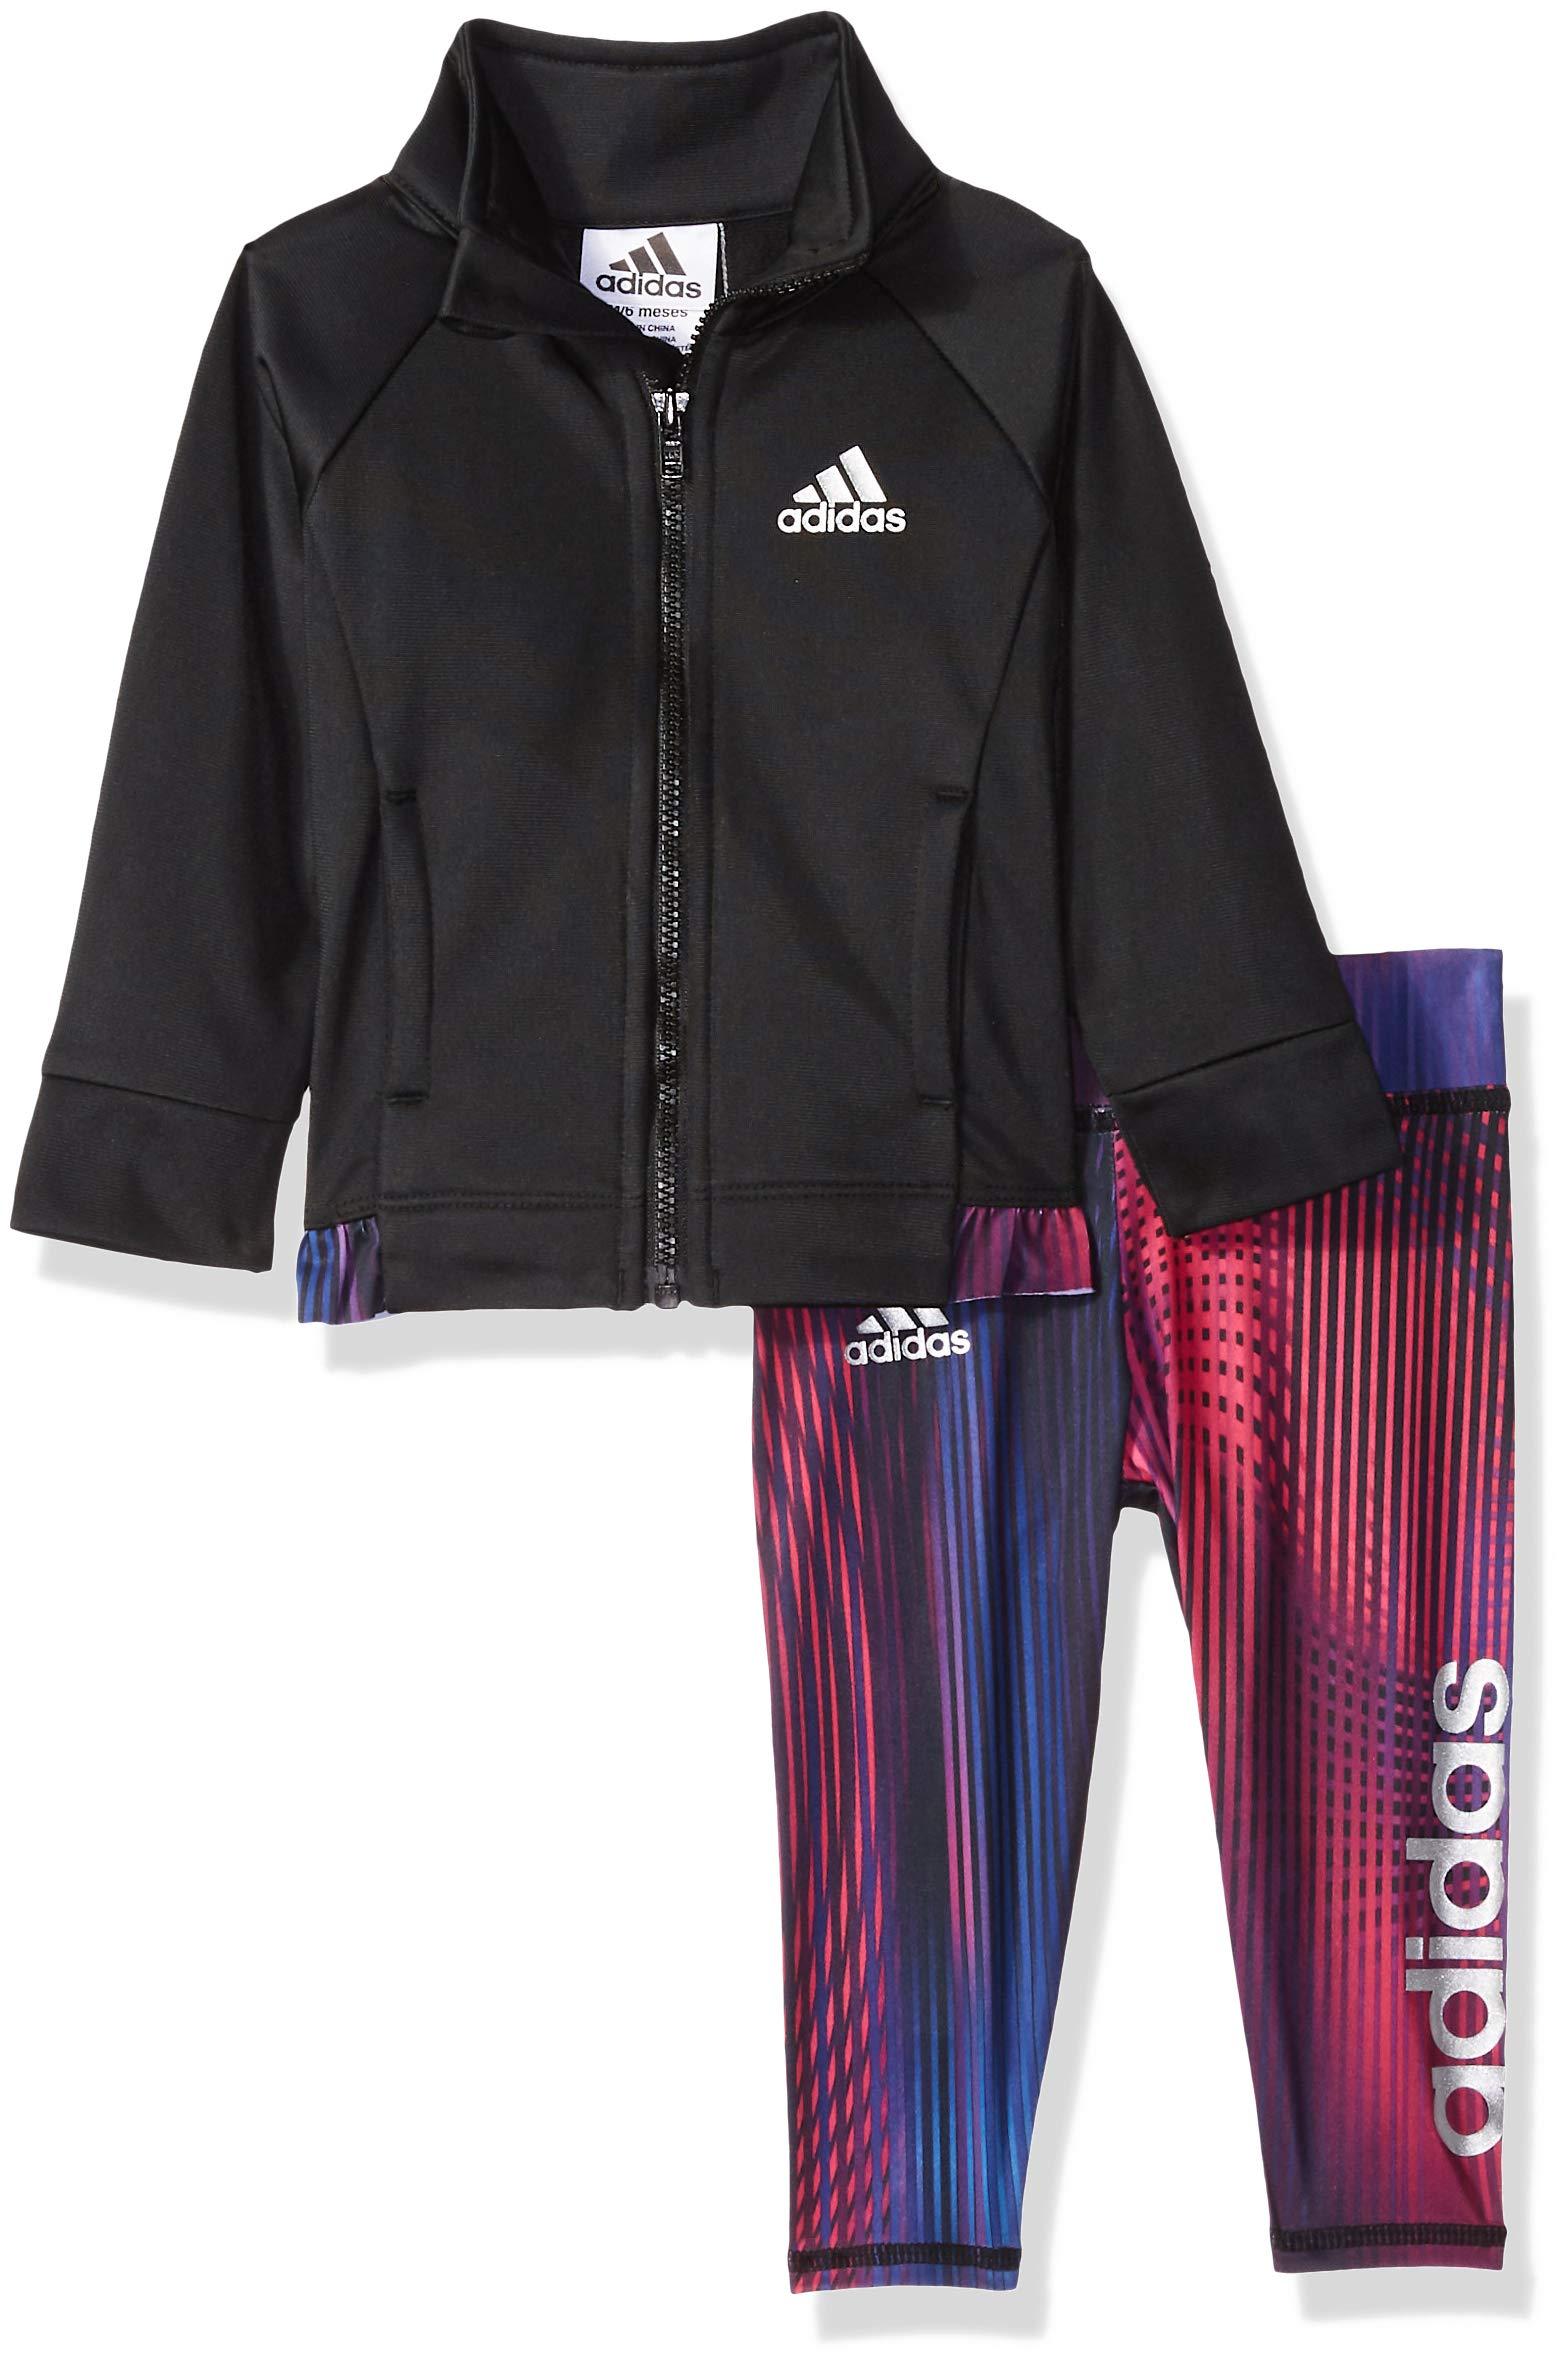 1b8567c7e Galleon - Adidas Baby Girls Zip Jacket And Pant Set, Black ADI 1, 12 Months